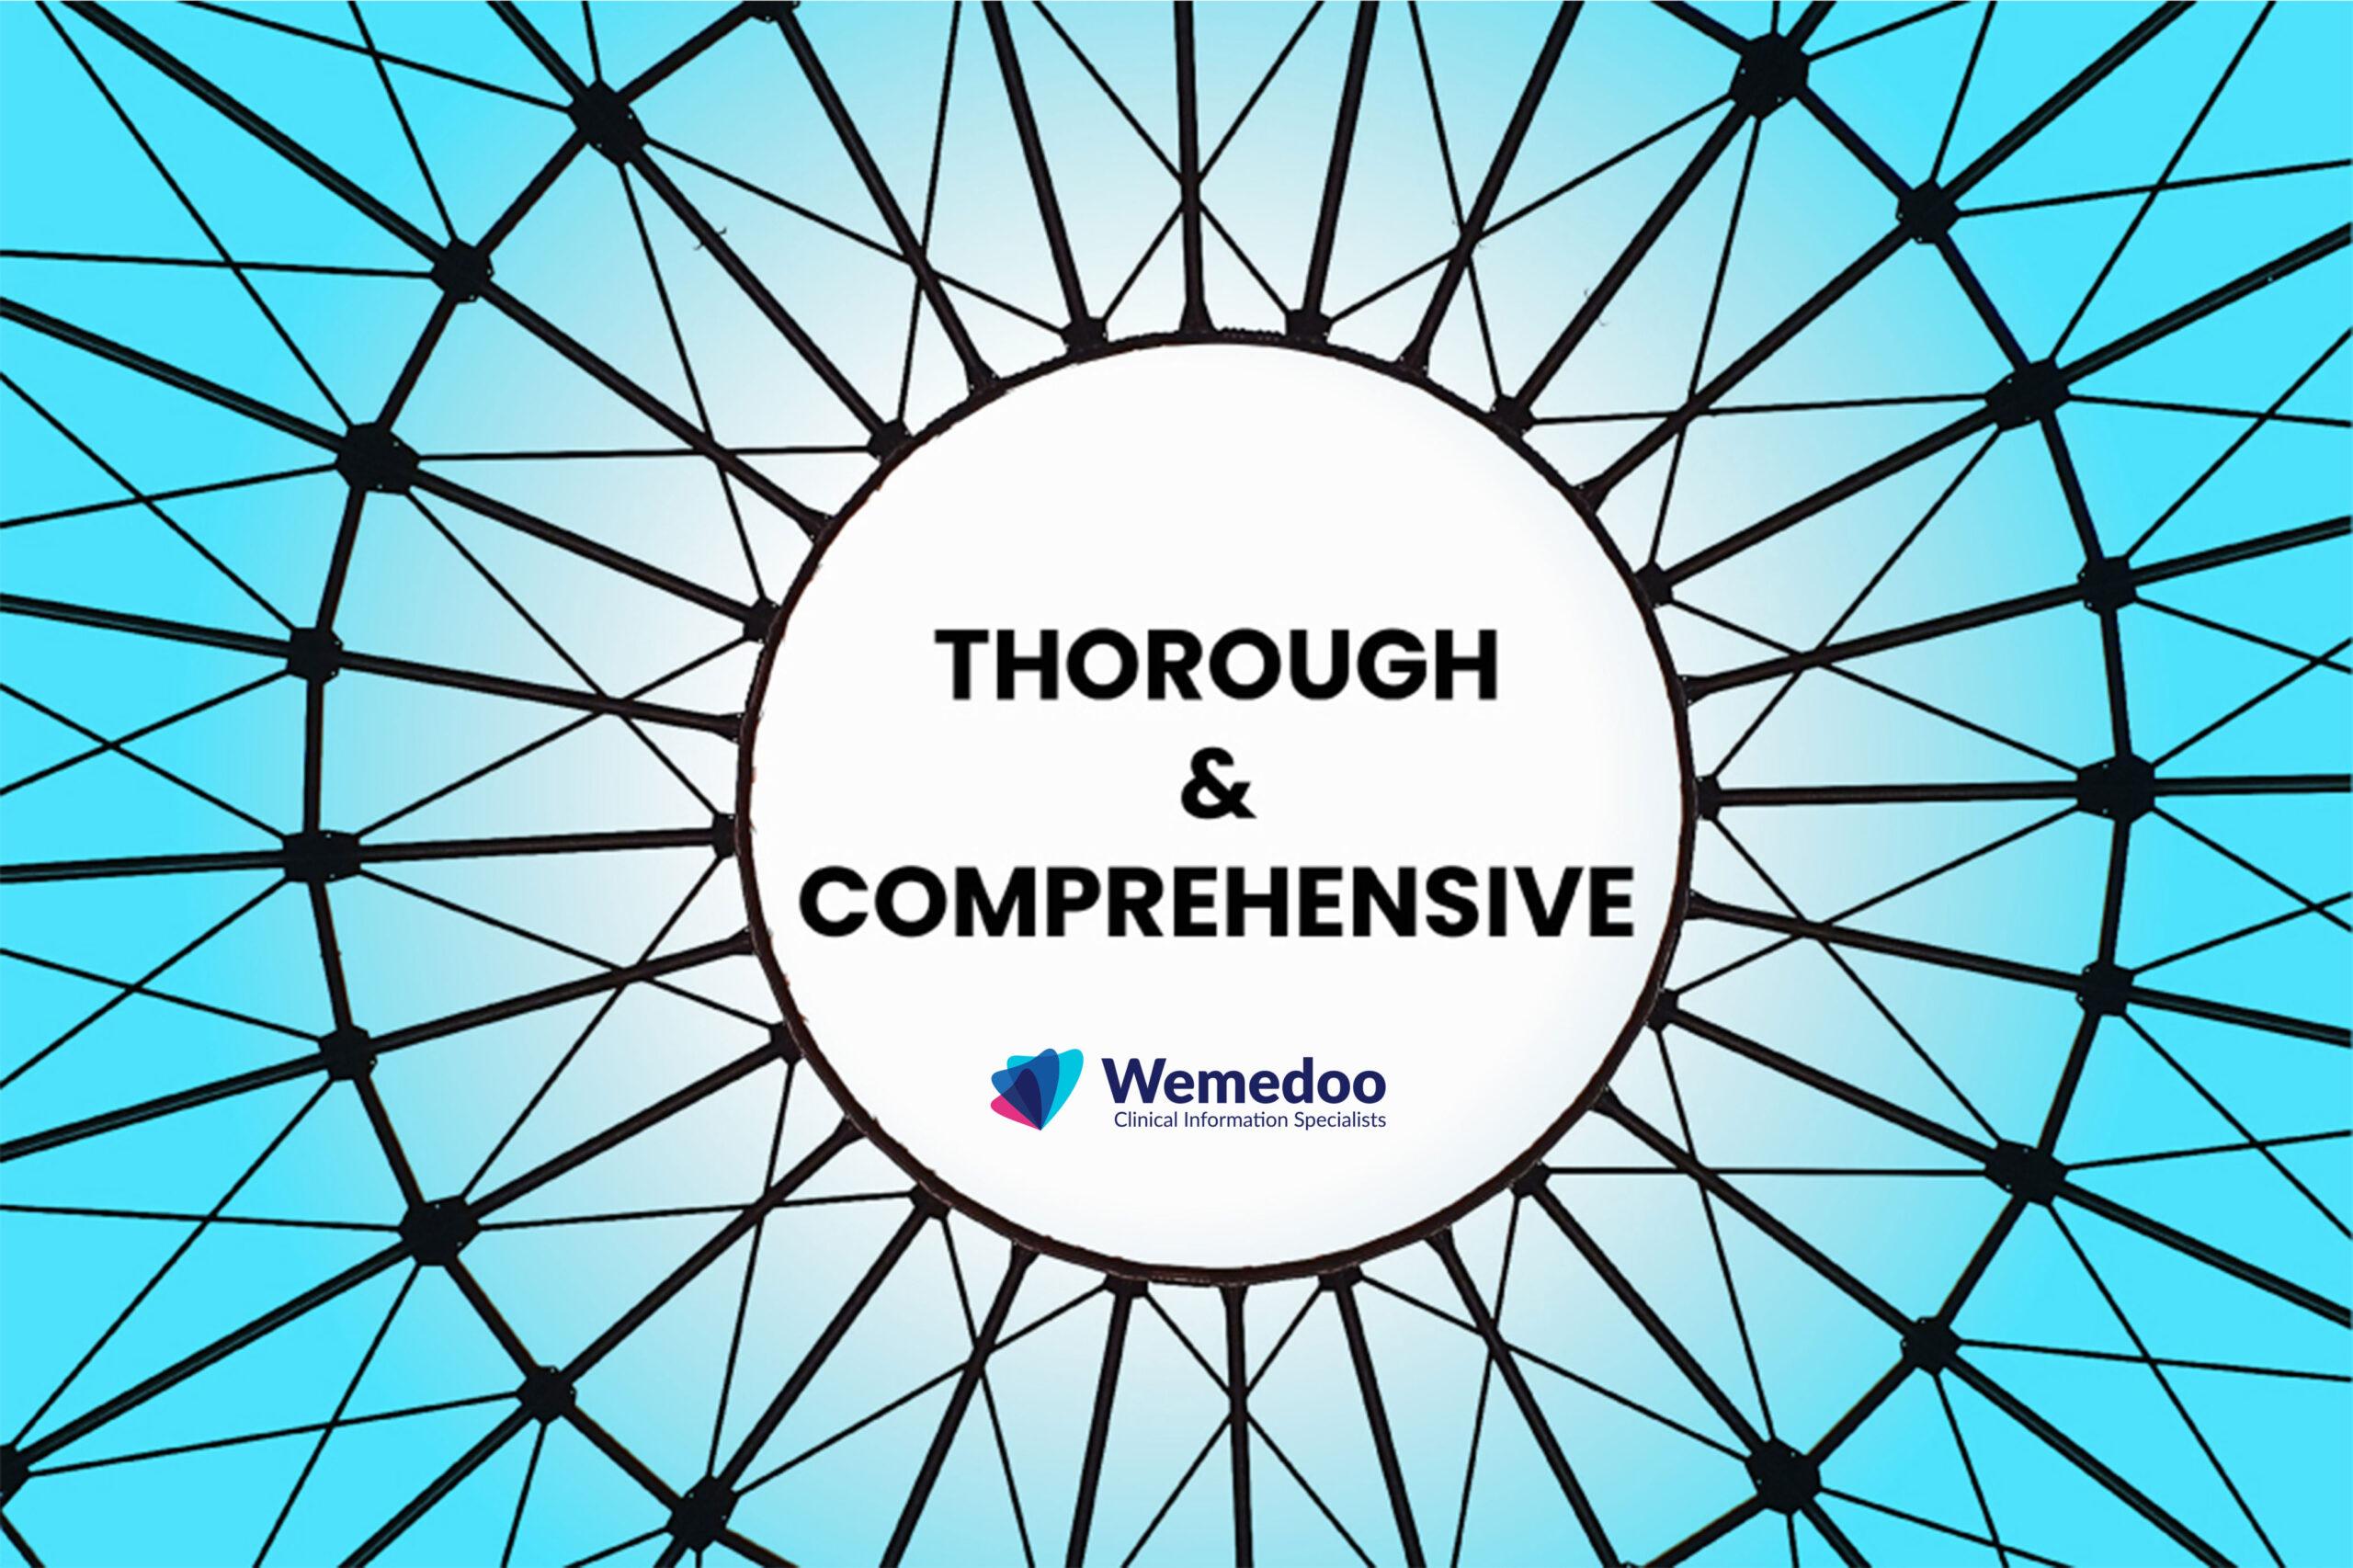 Basket, Umbrella, and Platform Trials – Emerging Concepts in Trial Design